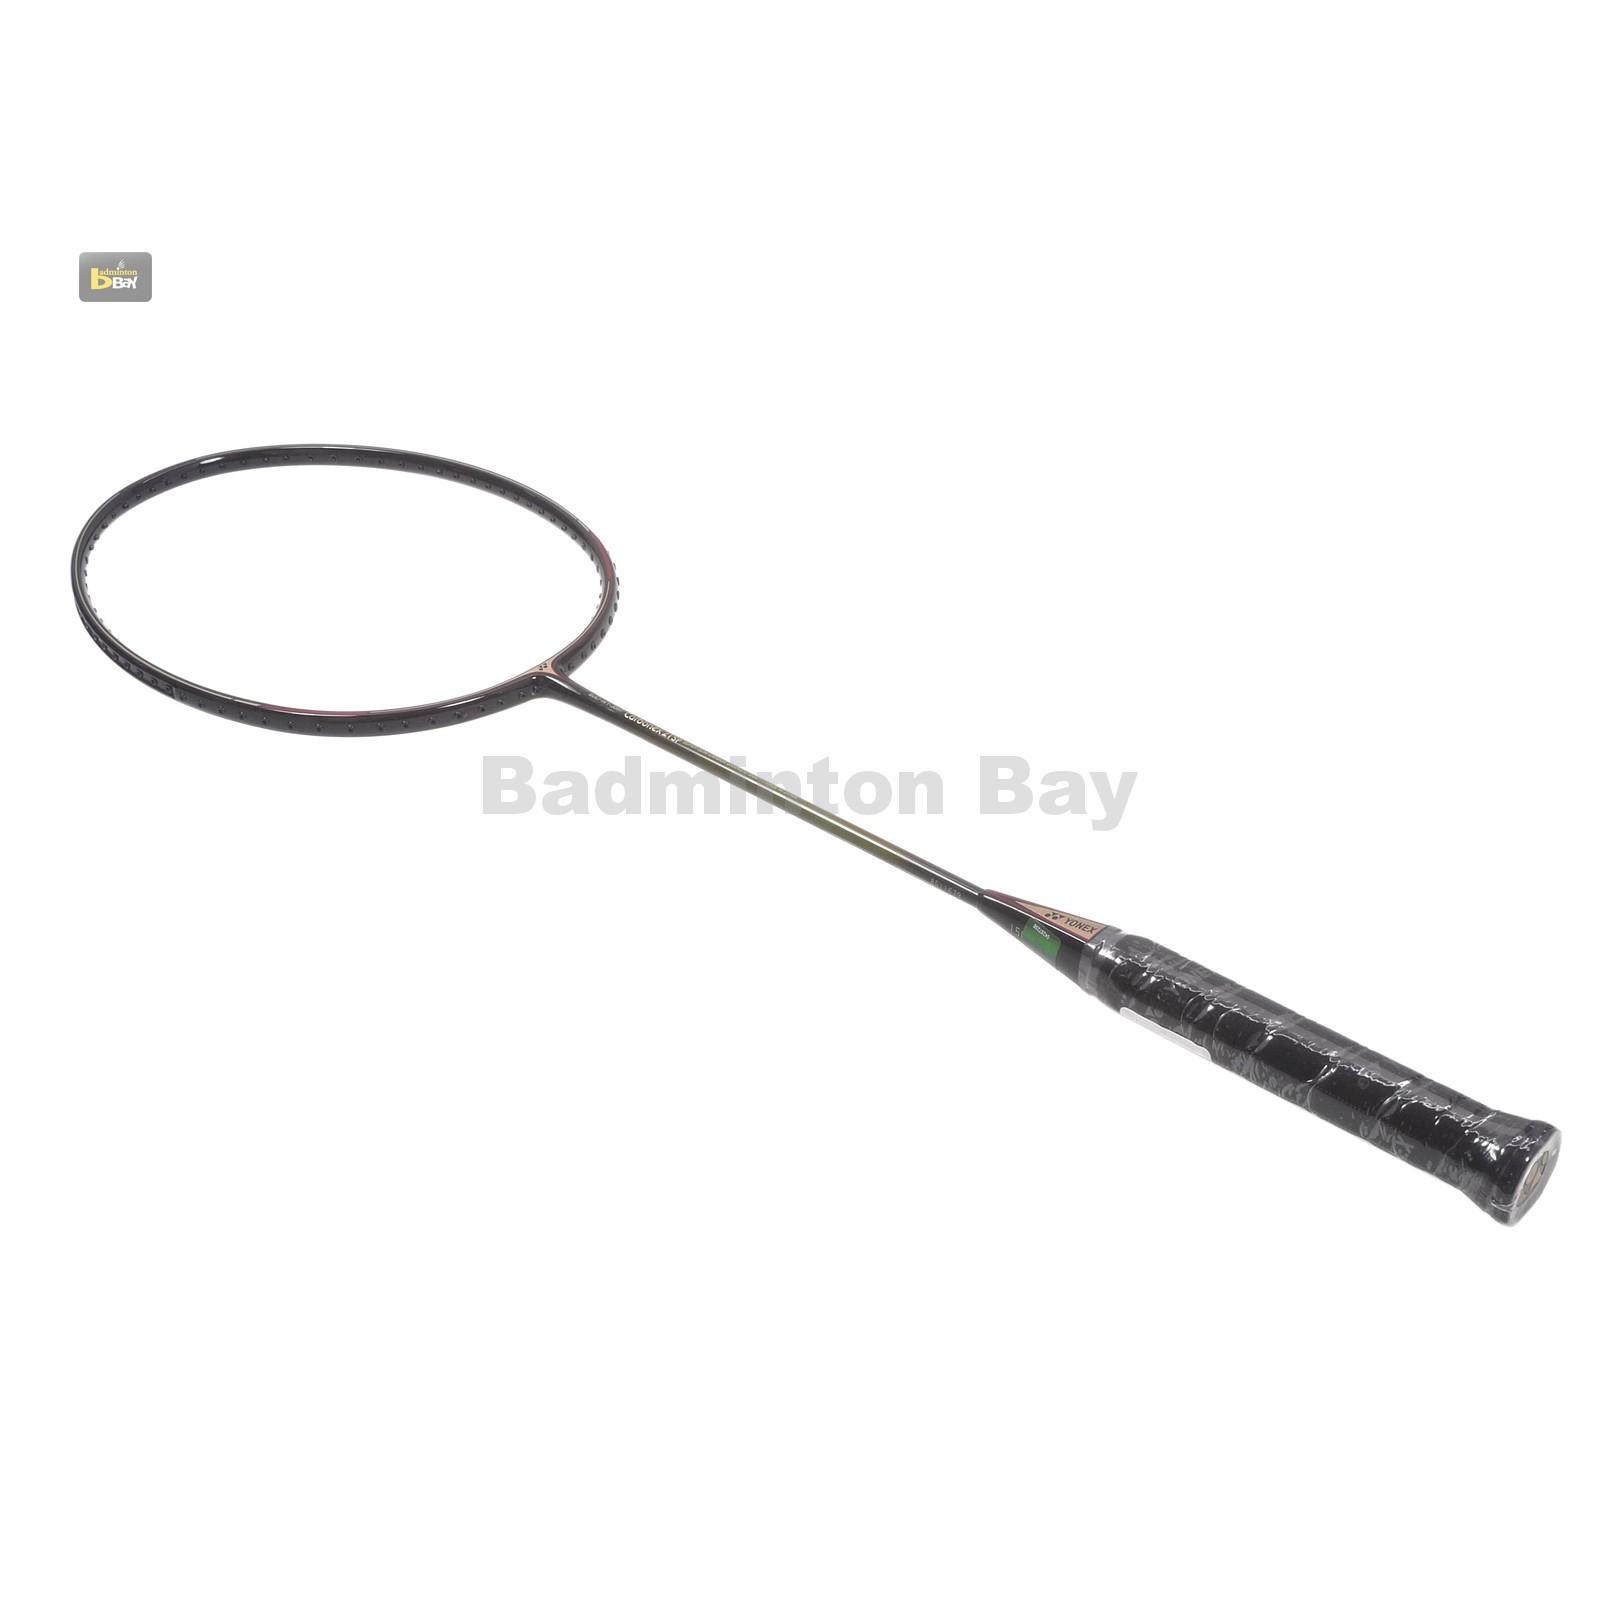 Out Of Stock Yonex Carbonex 21 SP CAB21 Badminton Racket